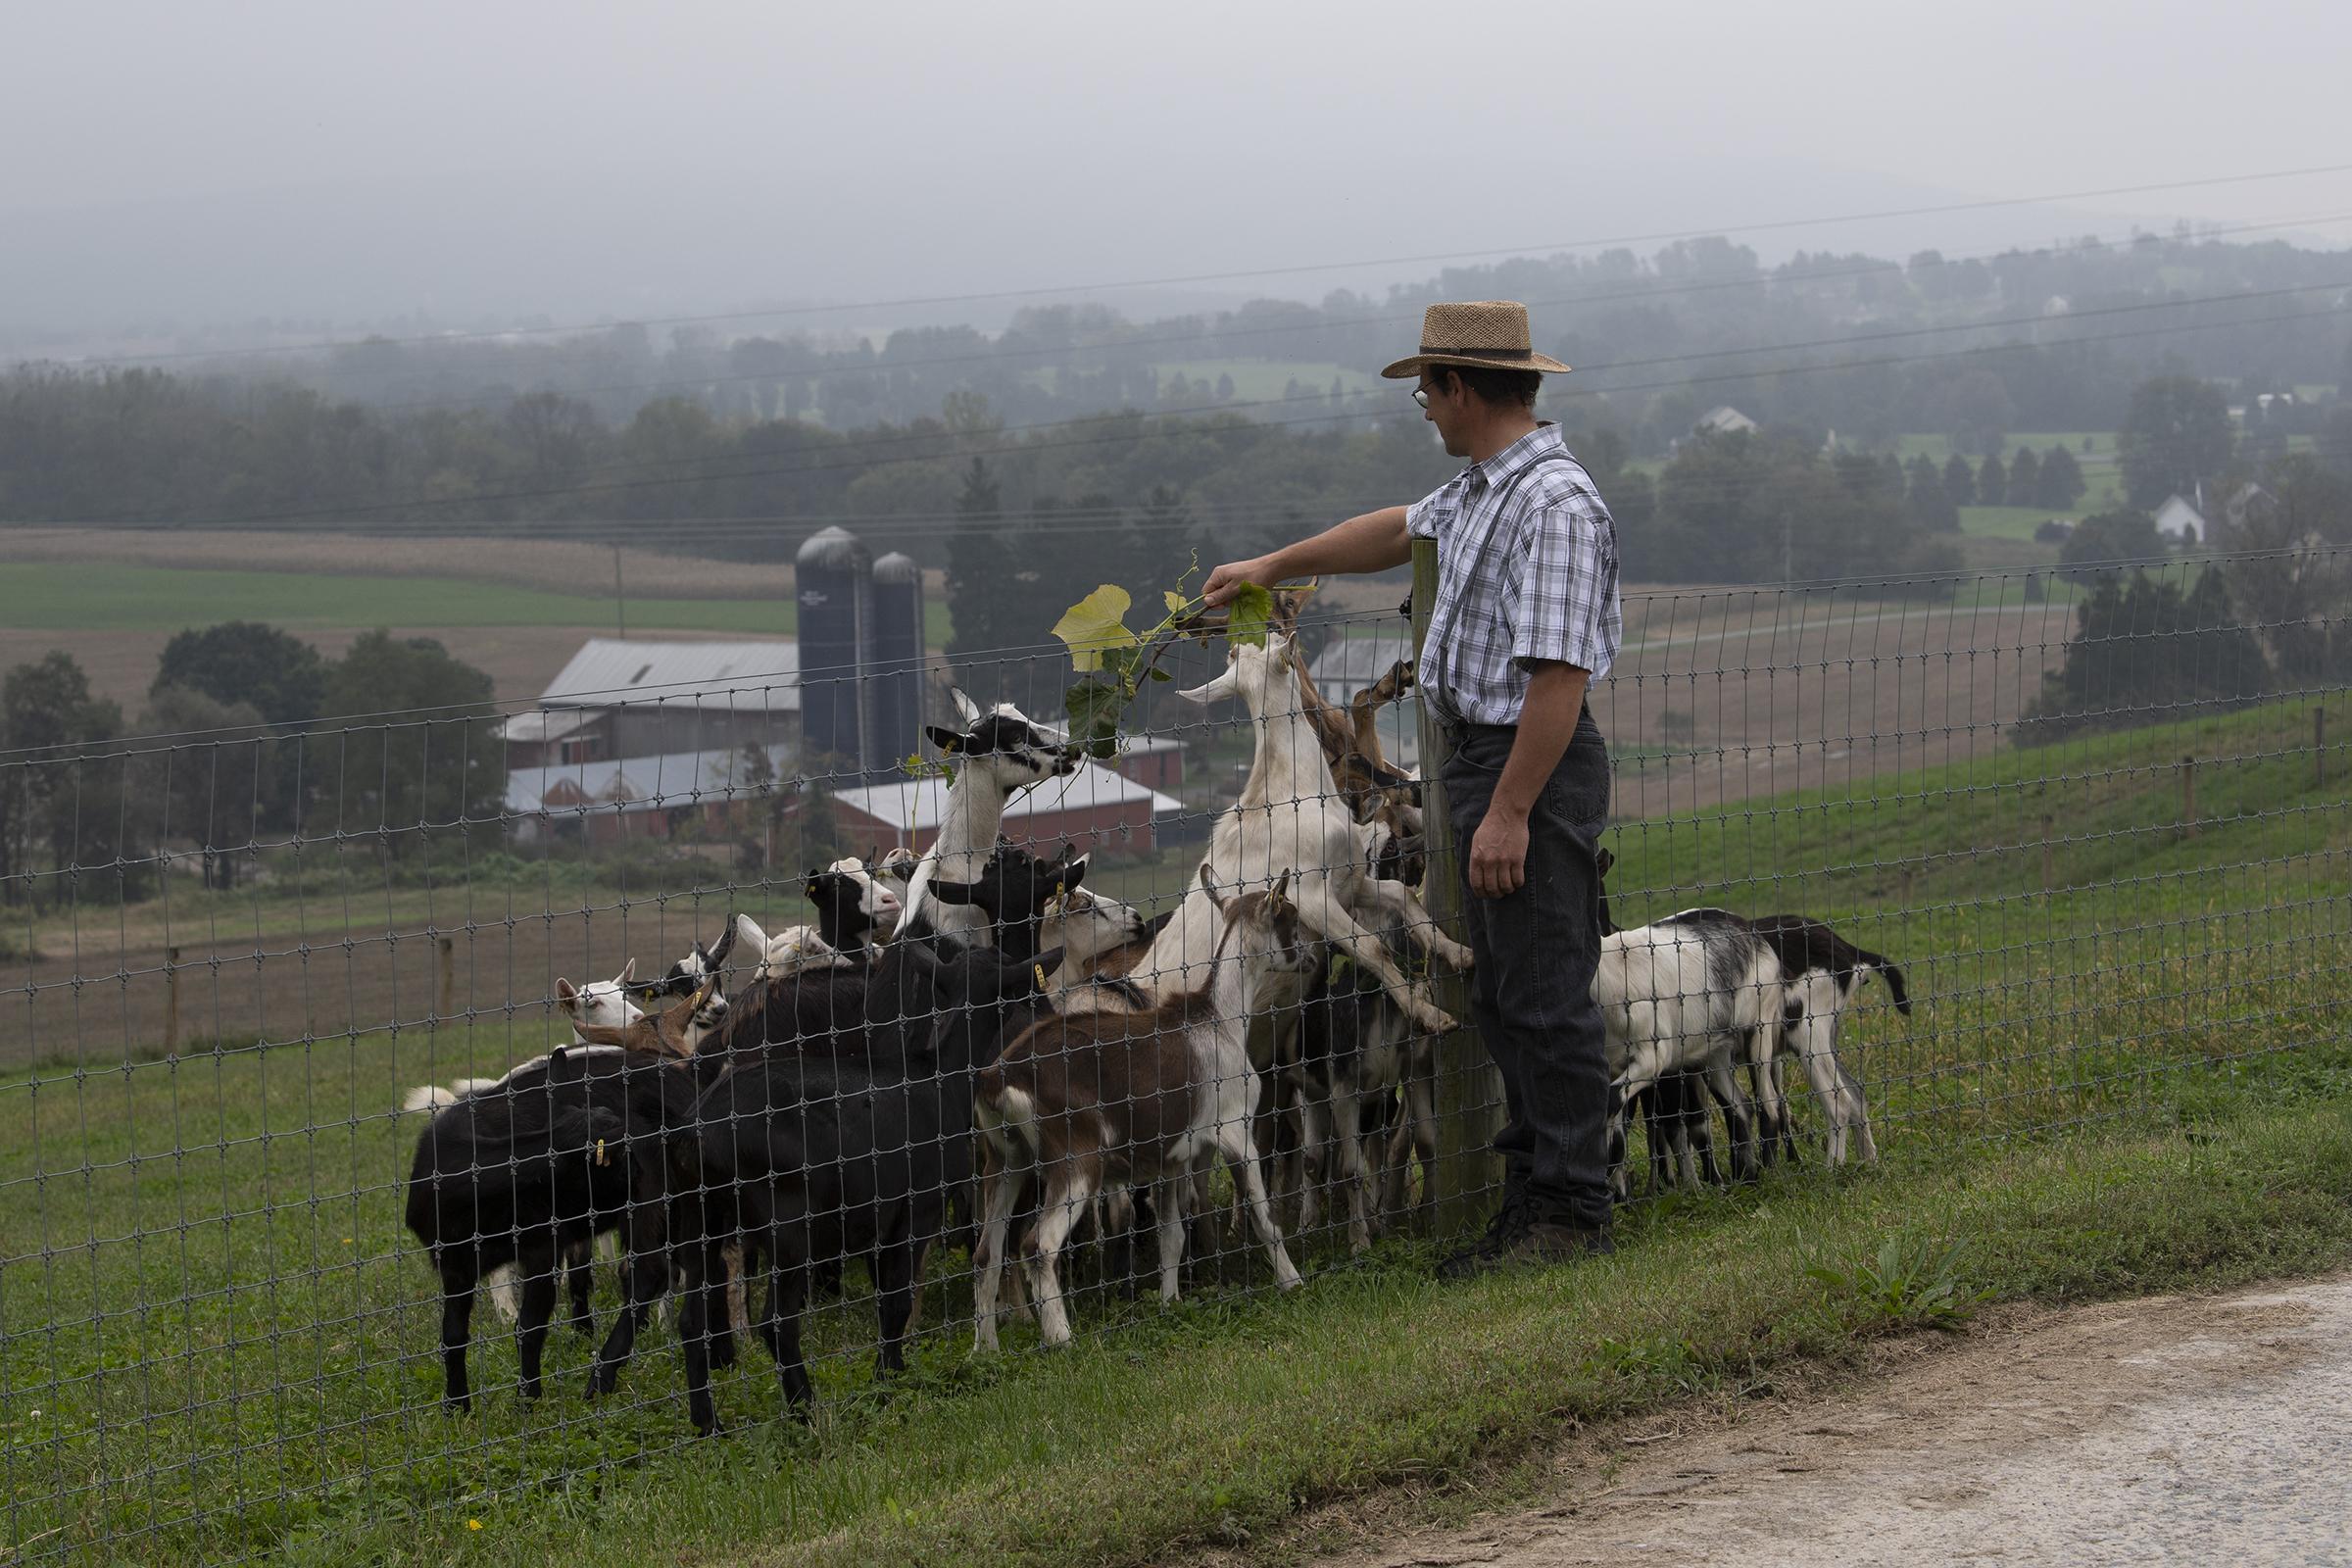 Farmer John Zimmerman feeds his goats at the Kirchenberg goat farm in Fleetwood, PA.